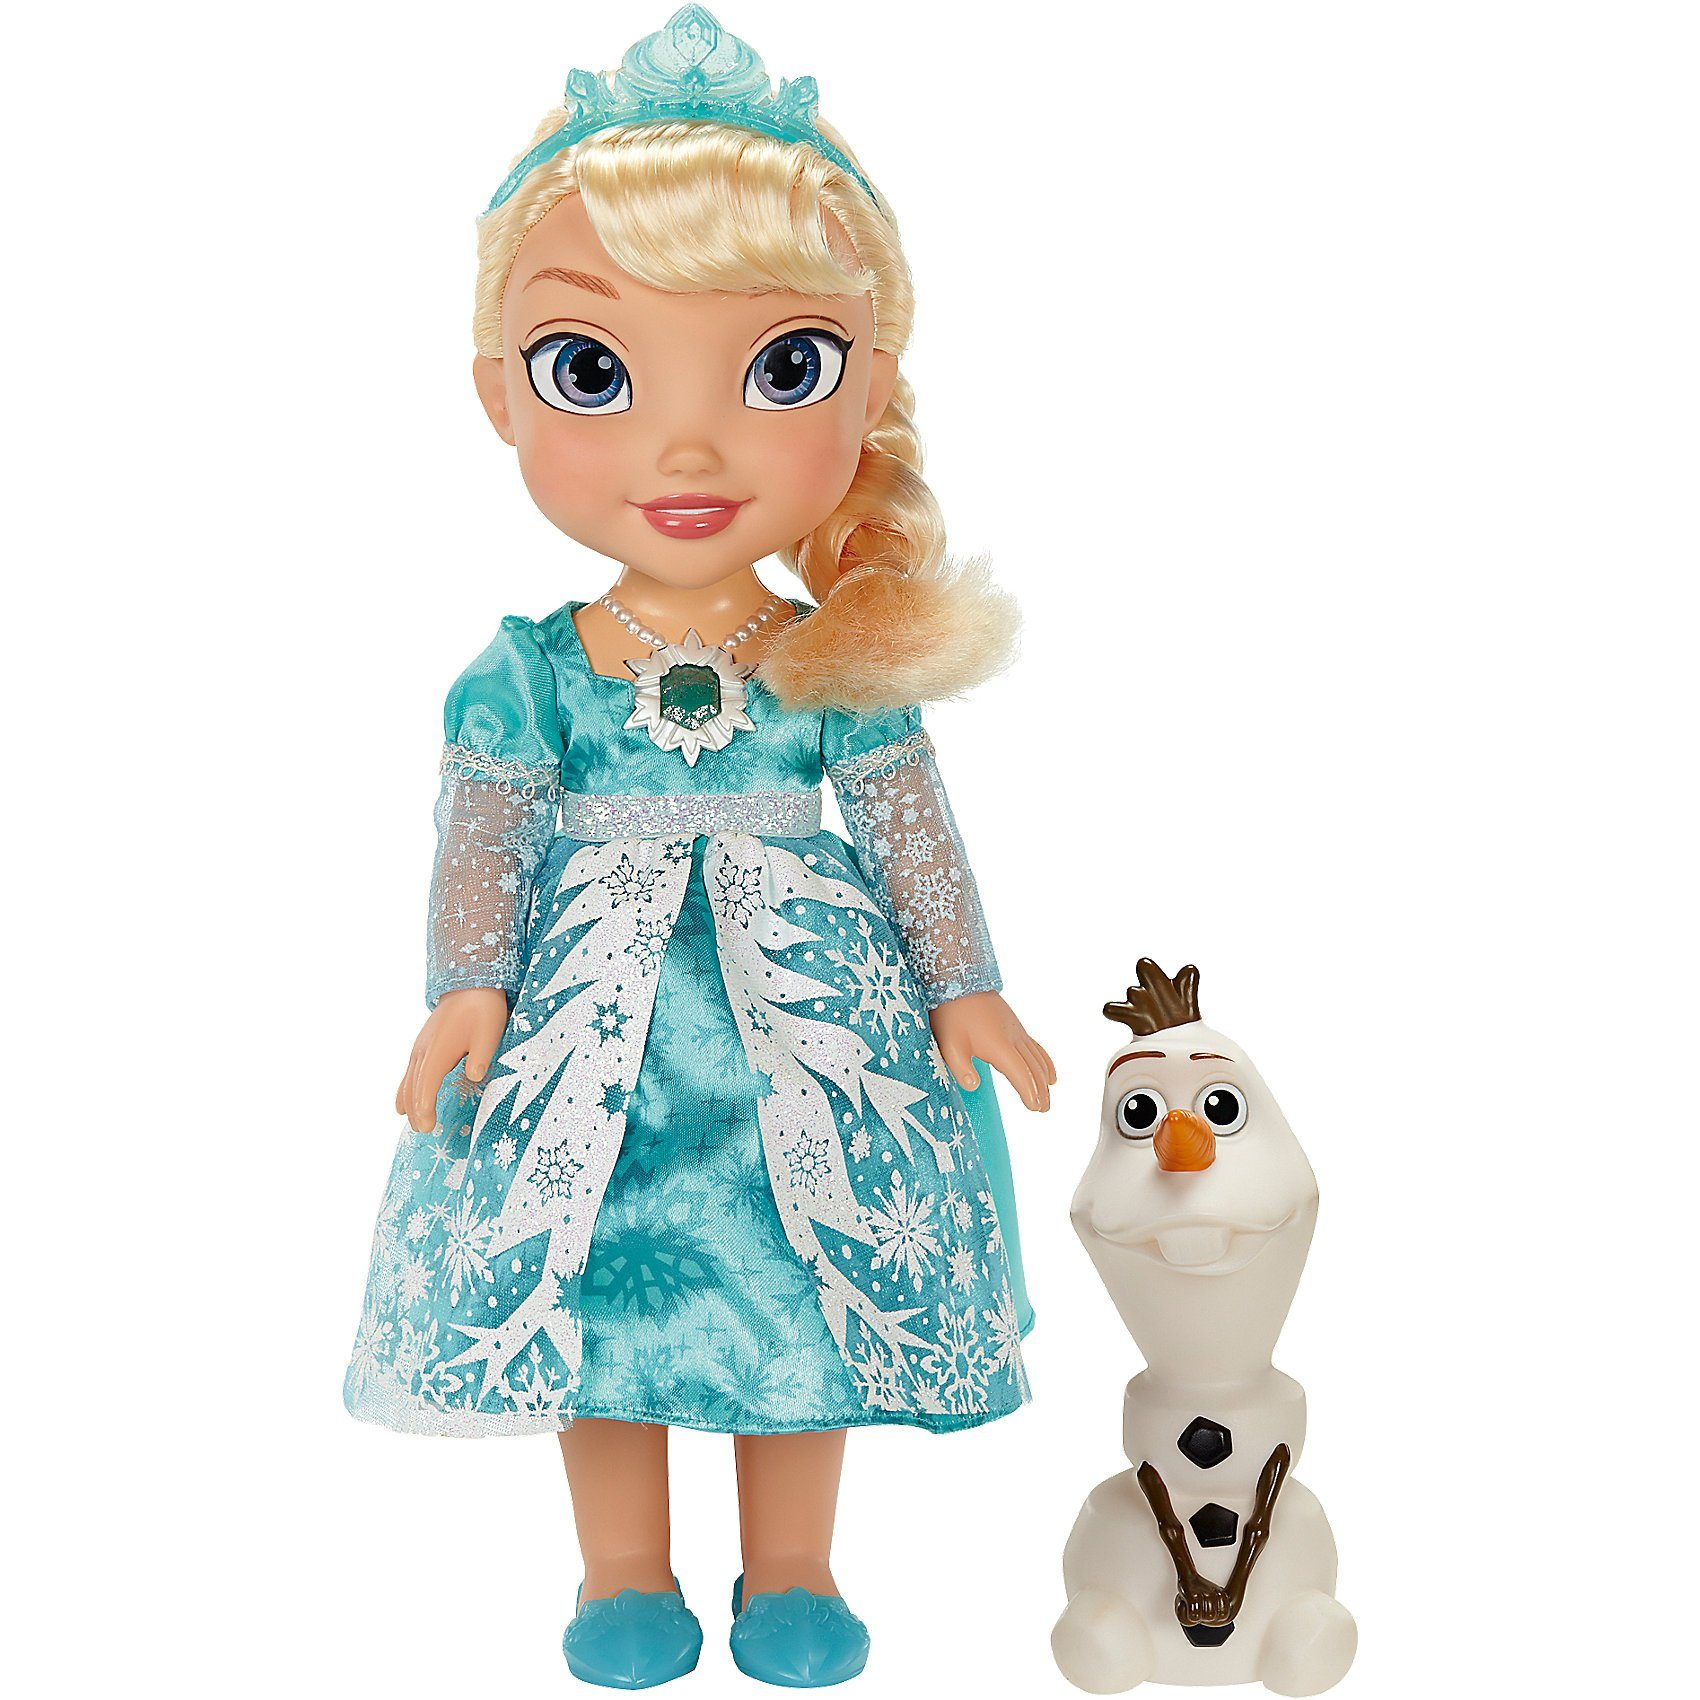 Jakks Pacific Disney Frozen Puppe Glitzerschnee Elsa 35 cm